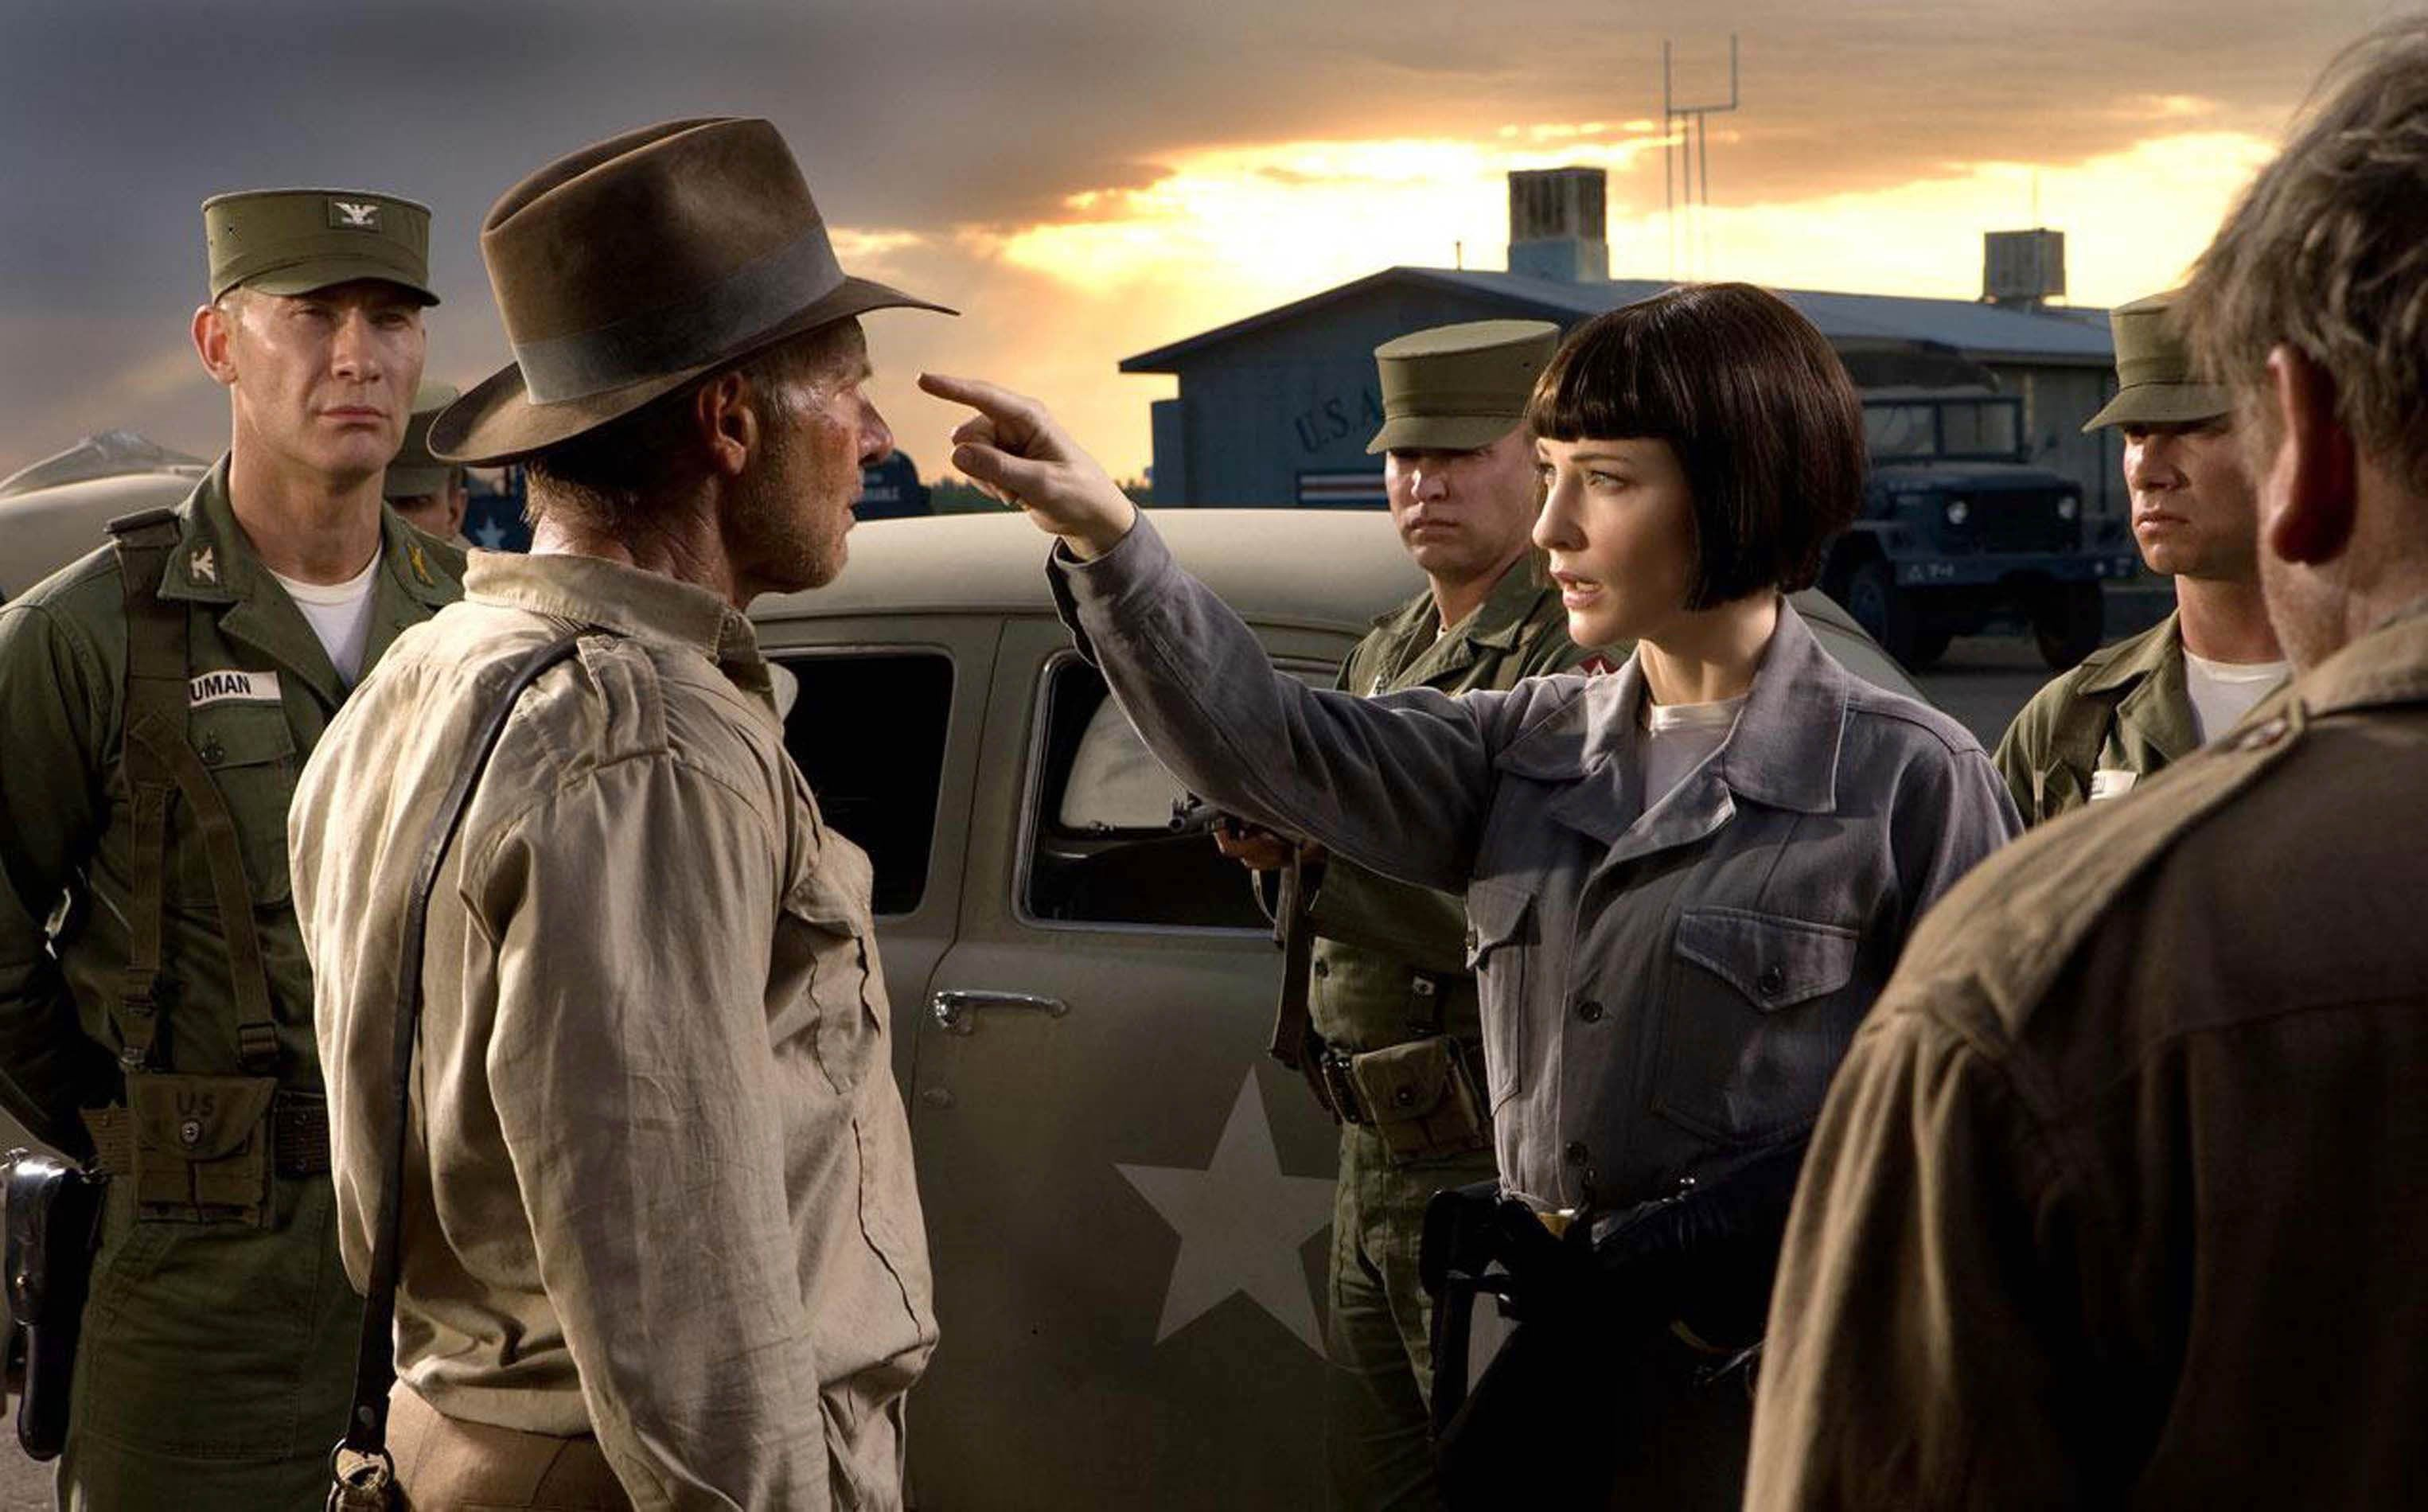 A scene from Indiana Jones